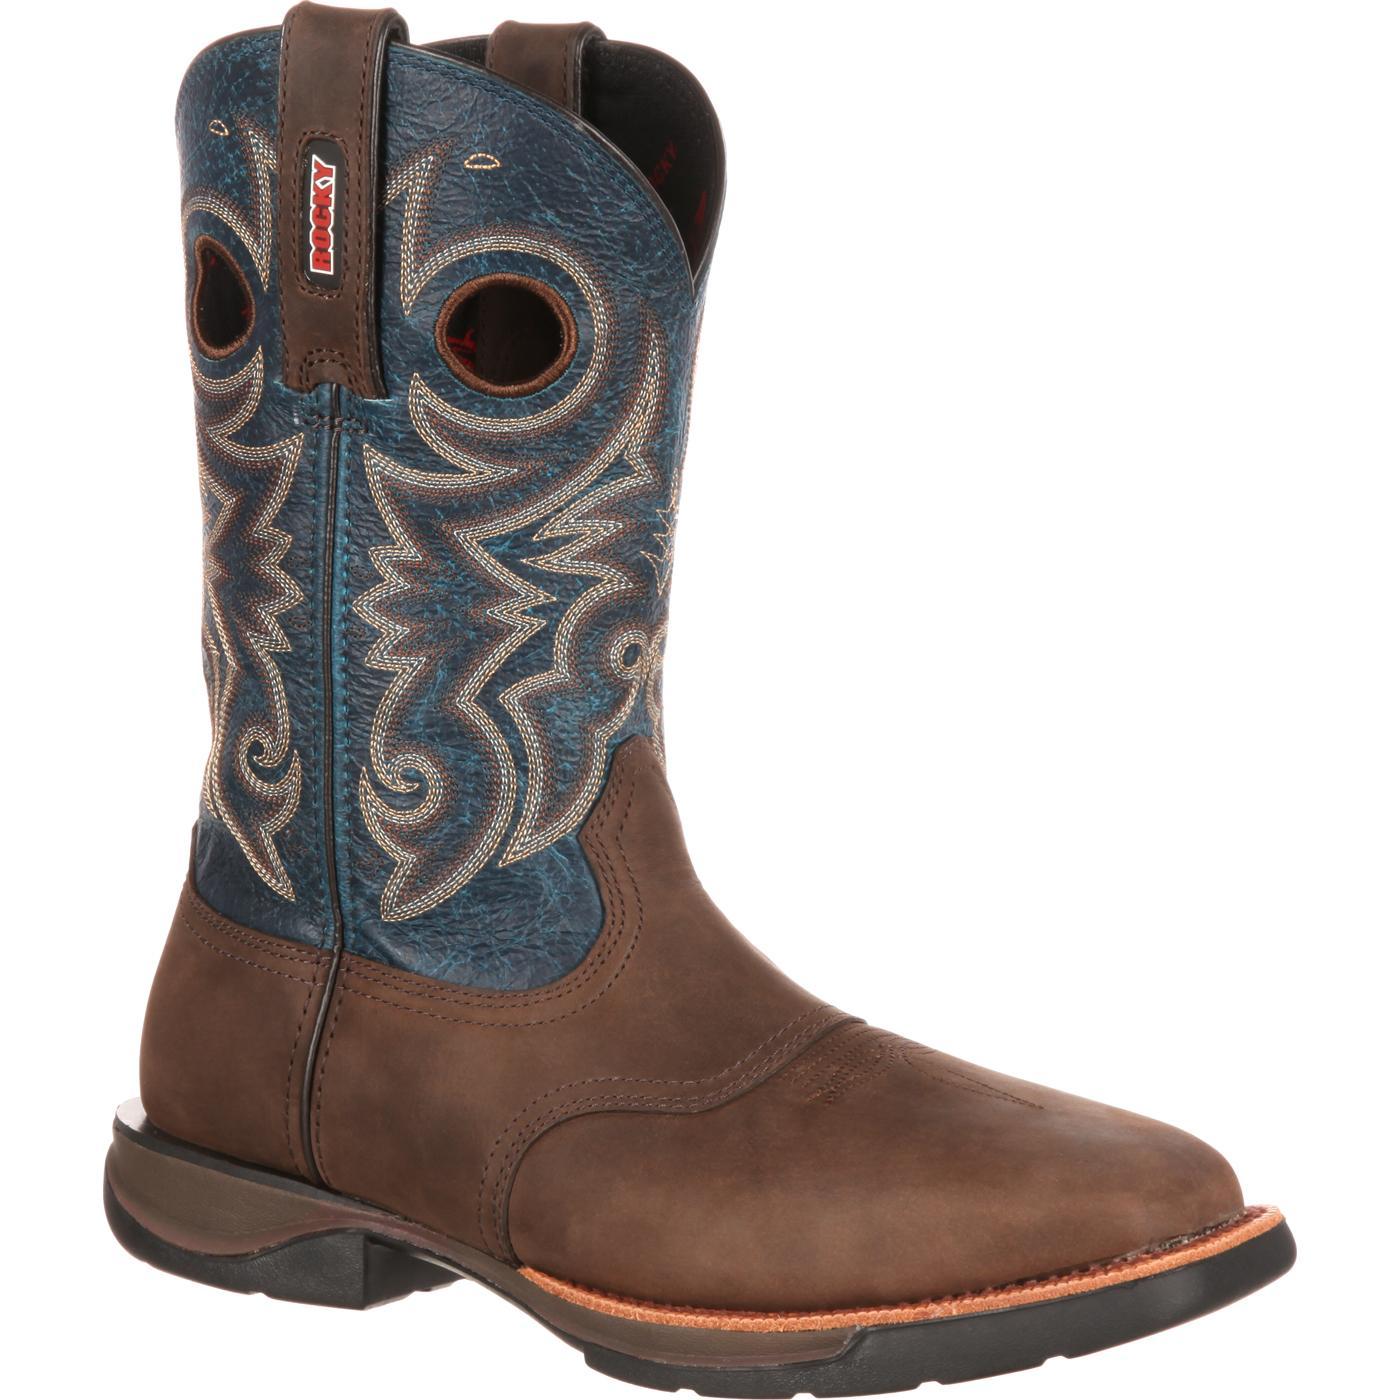 a8c4da51dd3 Rocky LT Steel Toe Saddle Western Boot